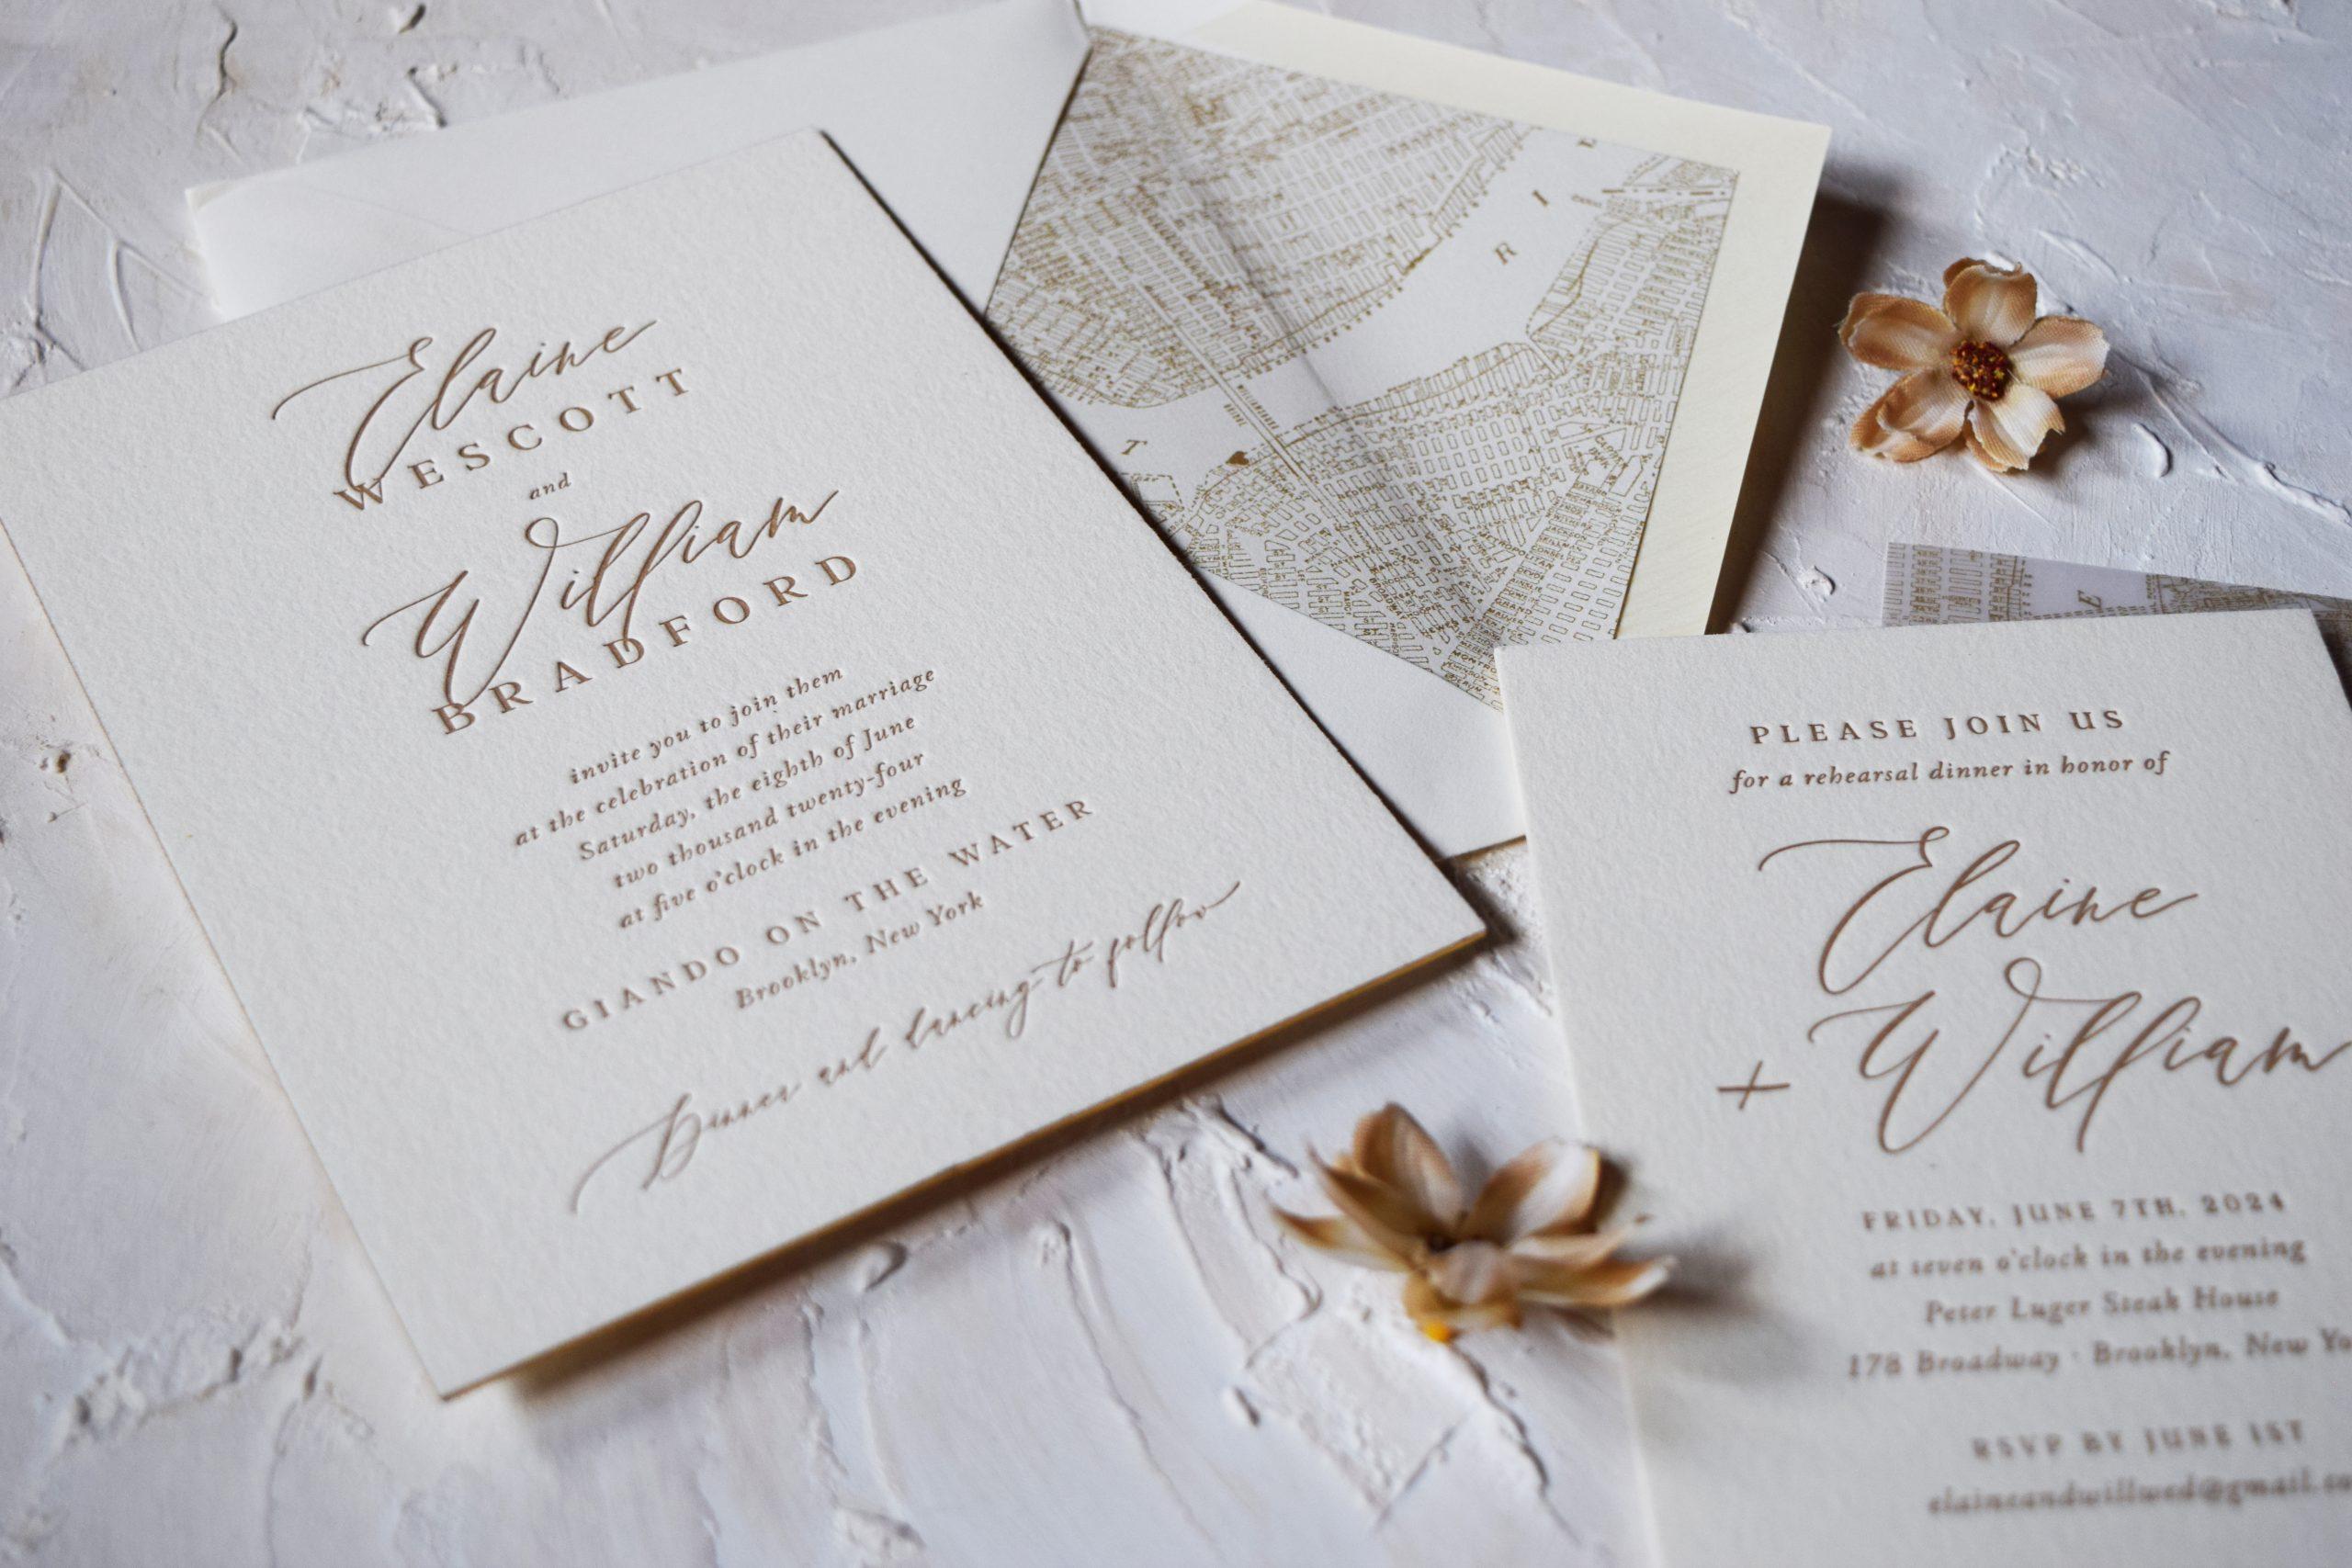 wedding invitation etiquette advice